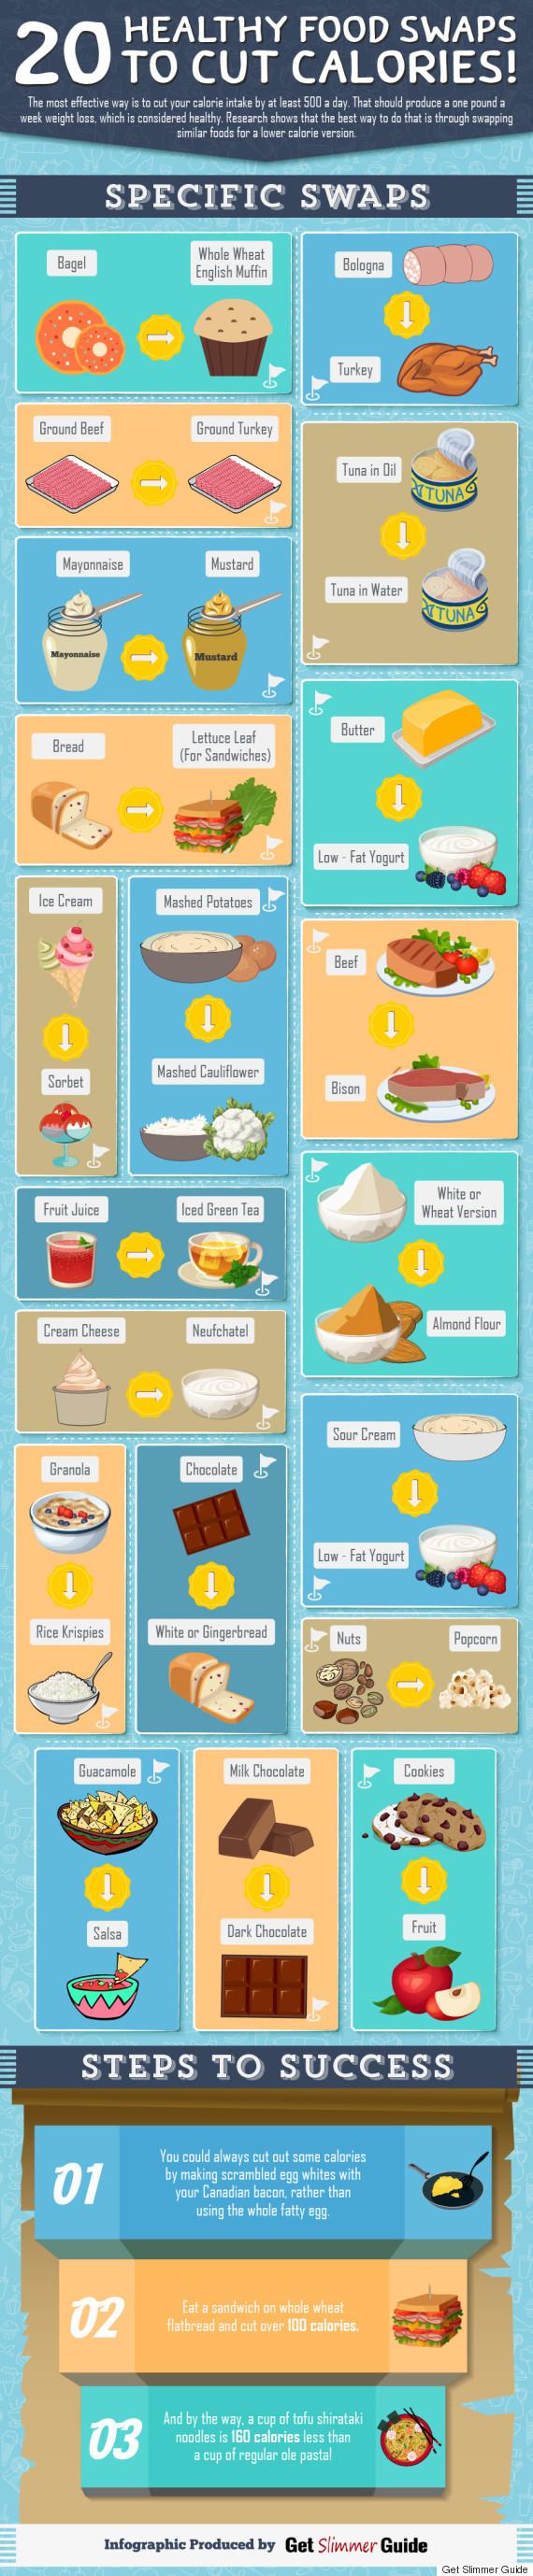 calorie saving food swaps